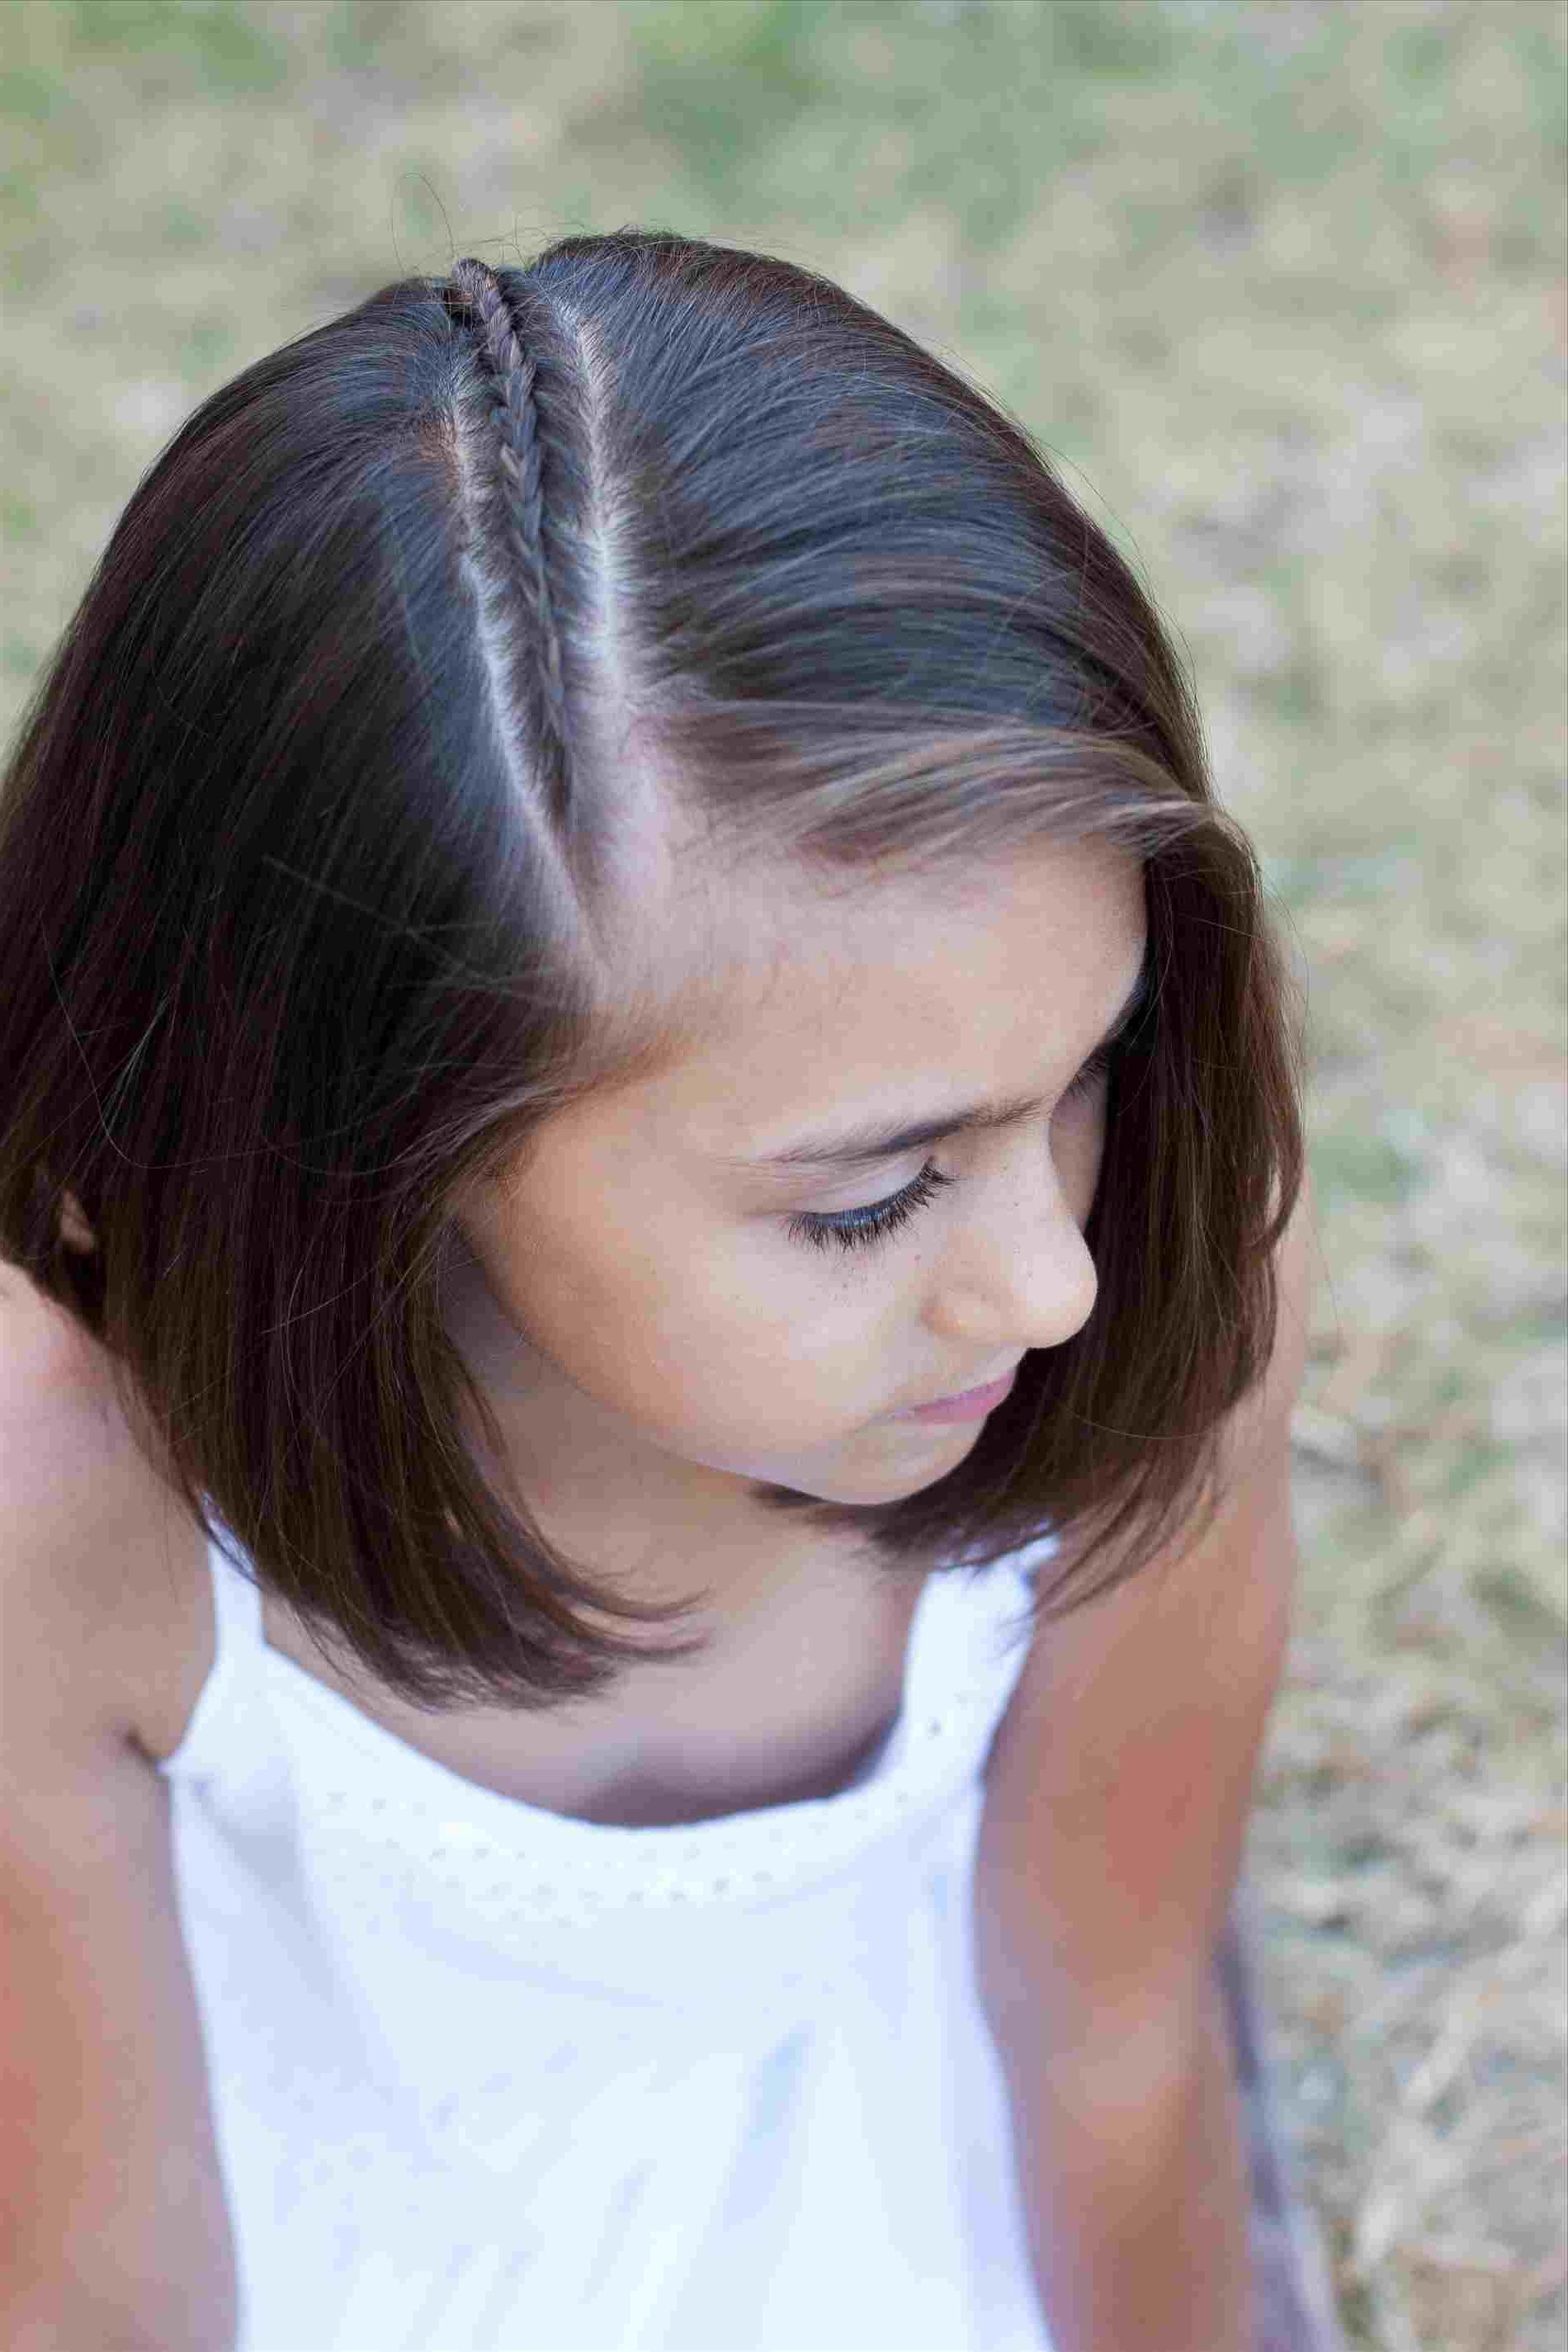 Rhmamukiscom Thick Hair Hairstylesrhshortshairstyleblogspotcom Short In Medium Short Haircuts For Thick Hair (View 24 of 25)